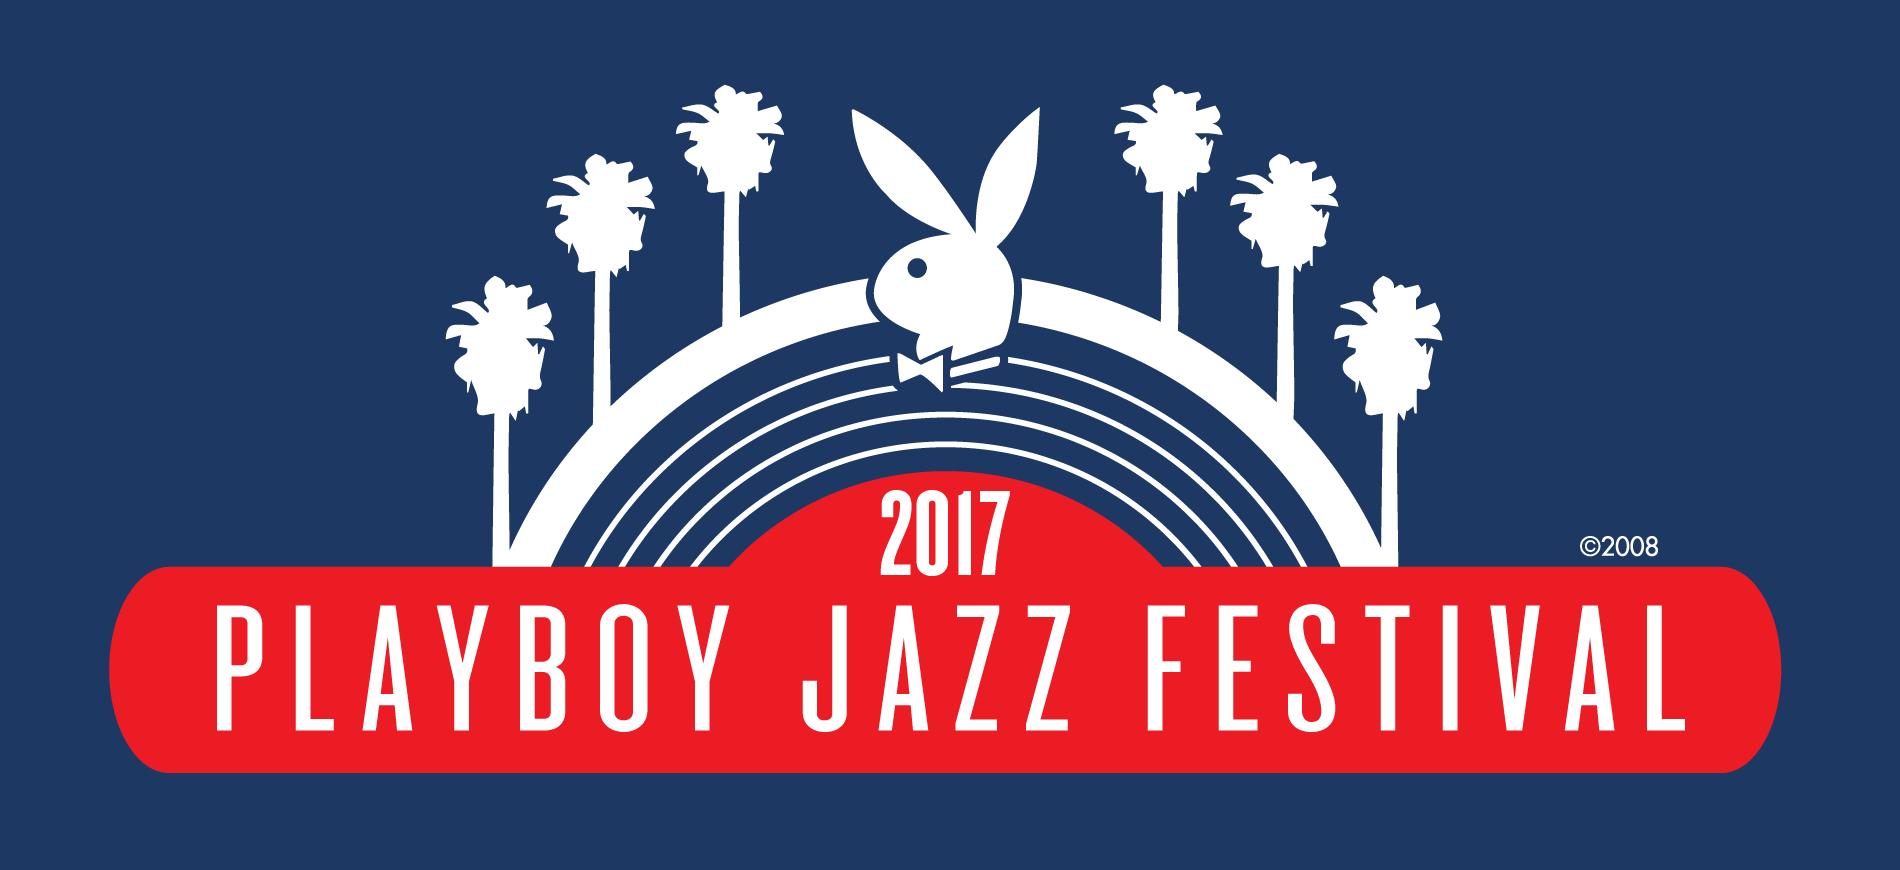 Playboy Jazz Fest 2017 banner